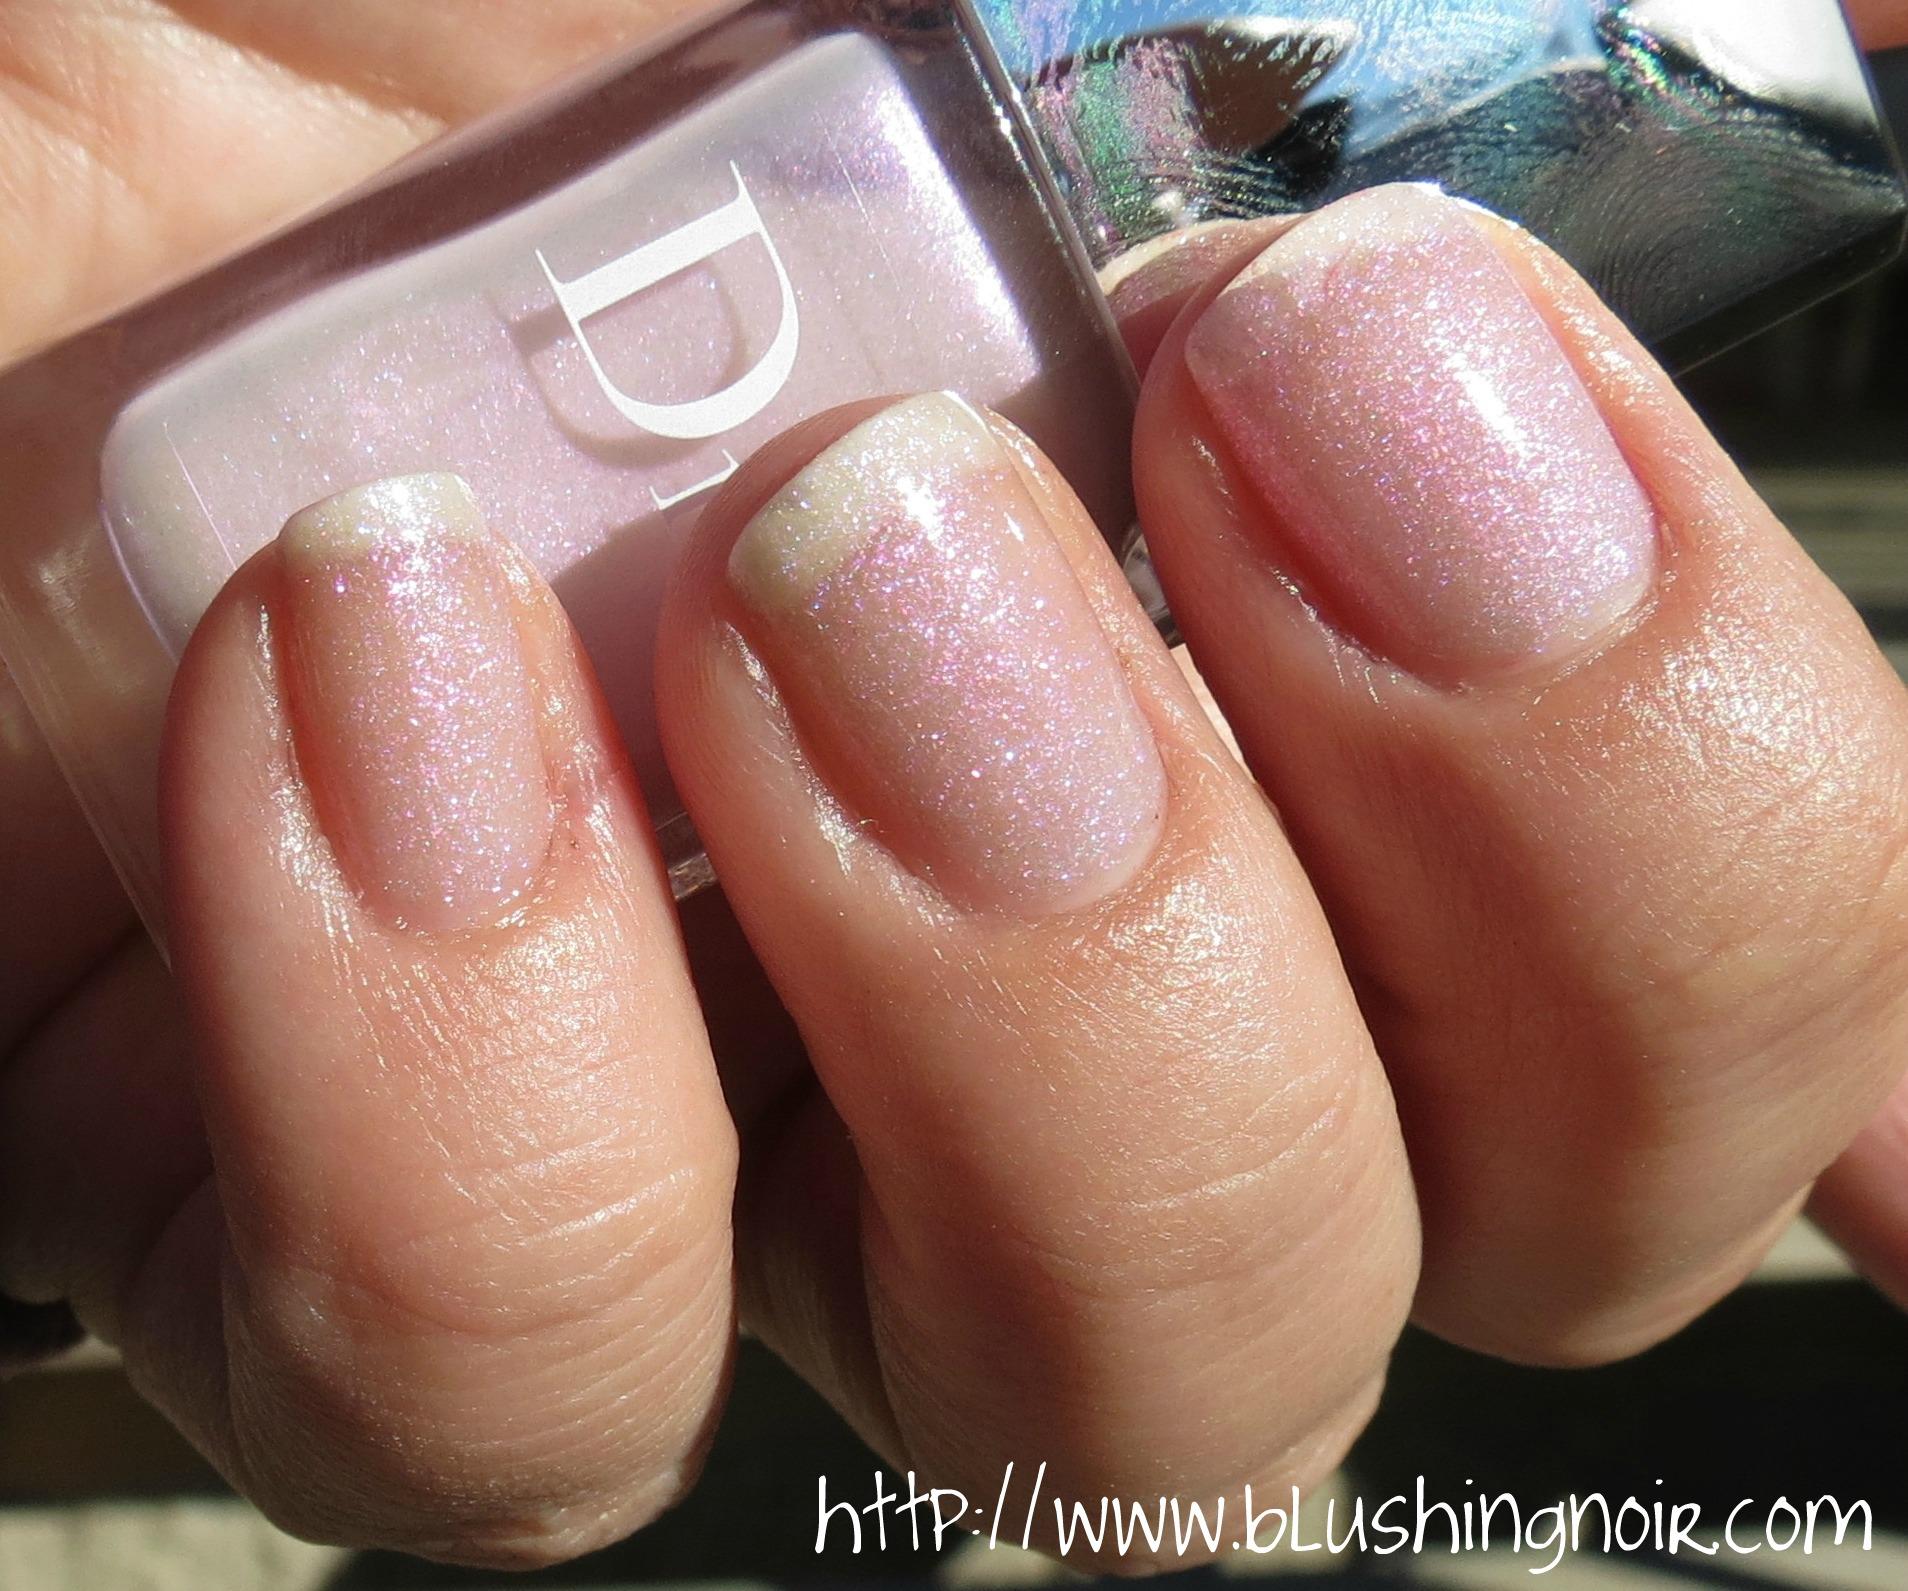 Vernis Nail: Dior 187 PERLE Le Vernis Nail Polish Swatches & Review